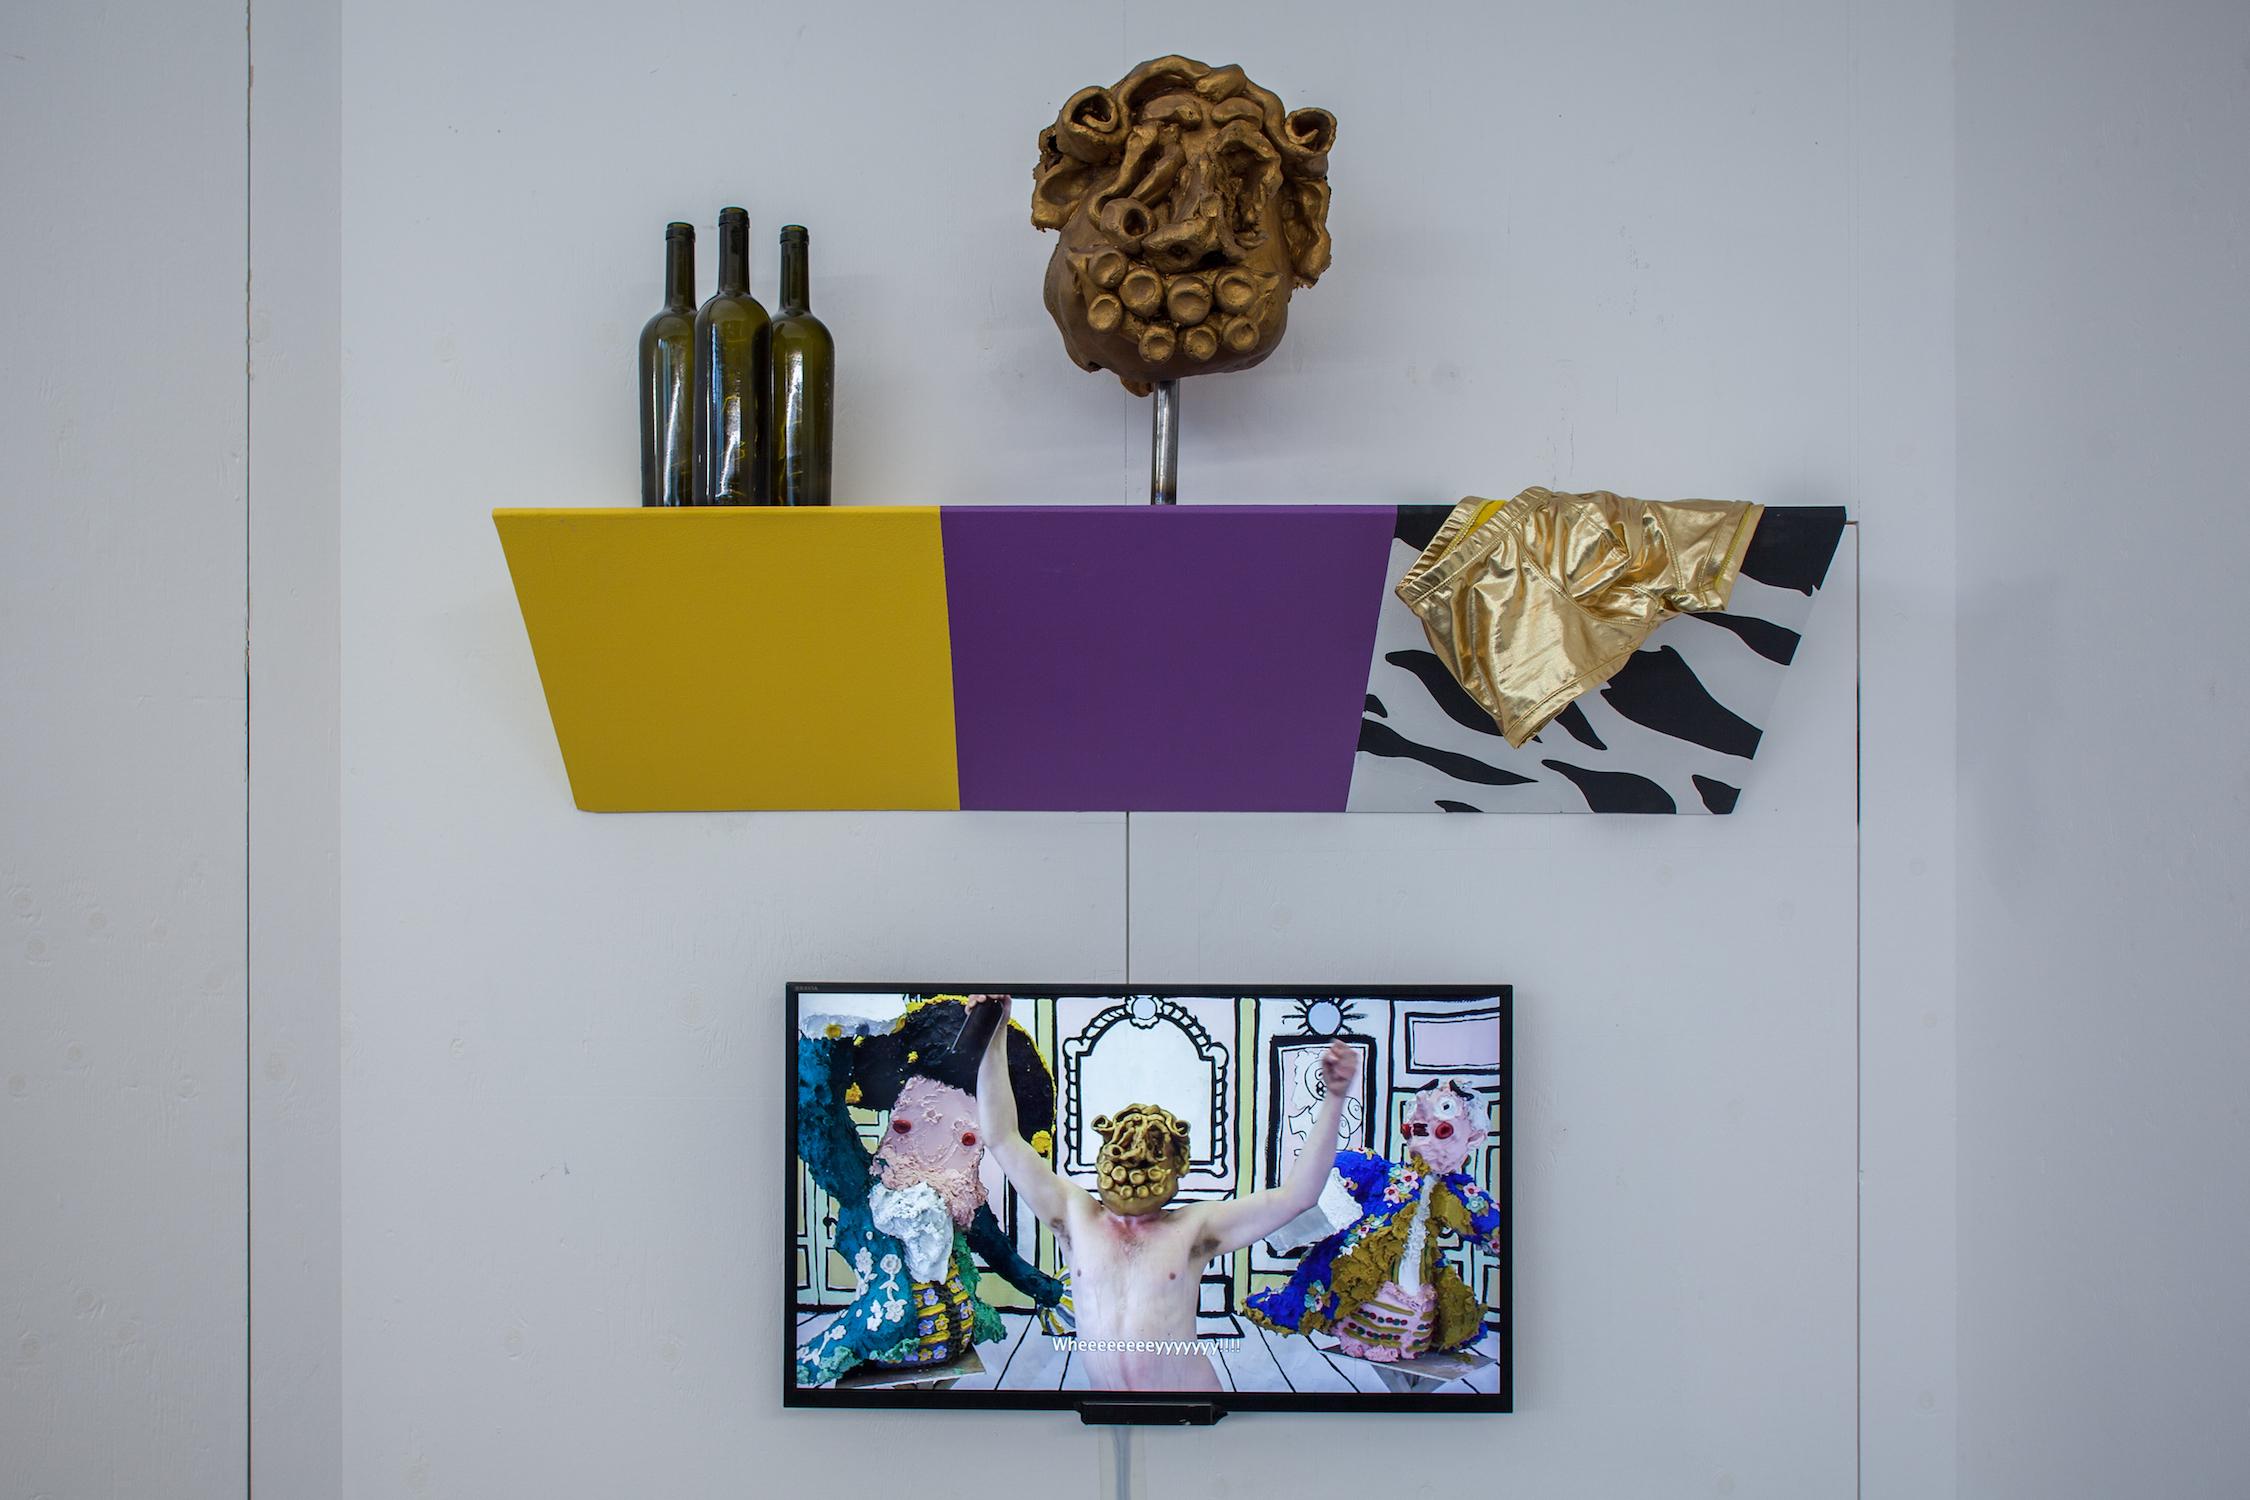 Jamie Fitzpatrick, SMUT, 2018. Installation view. VITRINE, Basel. Photographer: Nicolas Gysin.